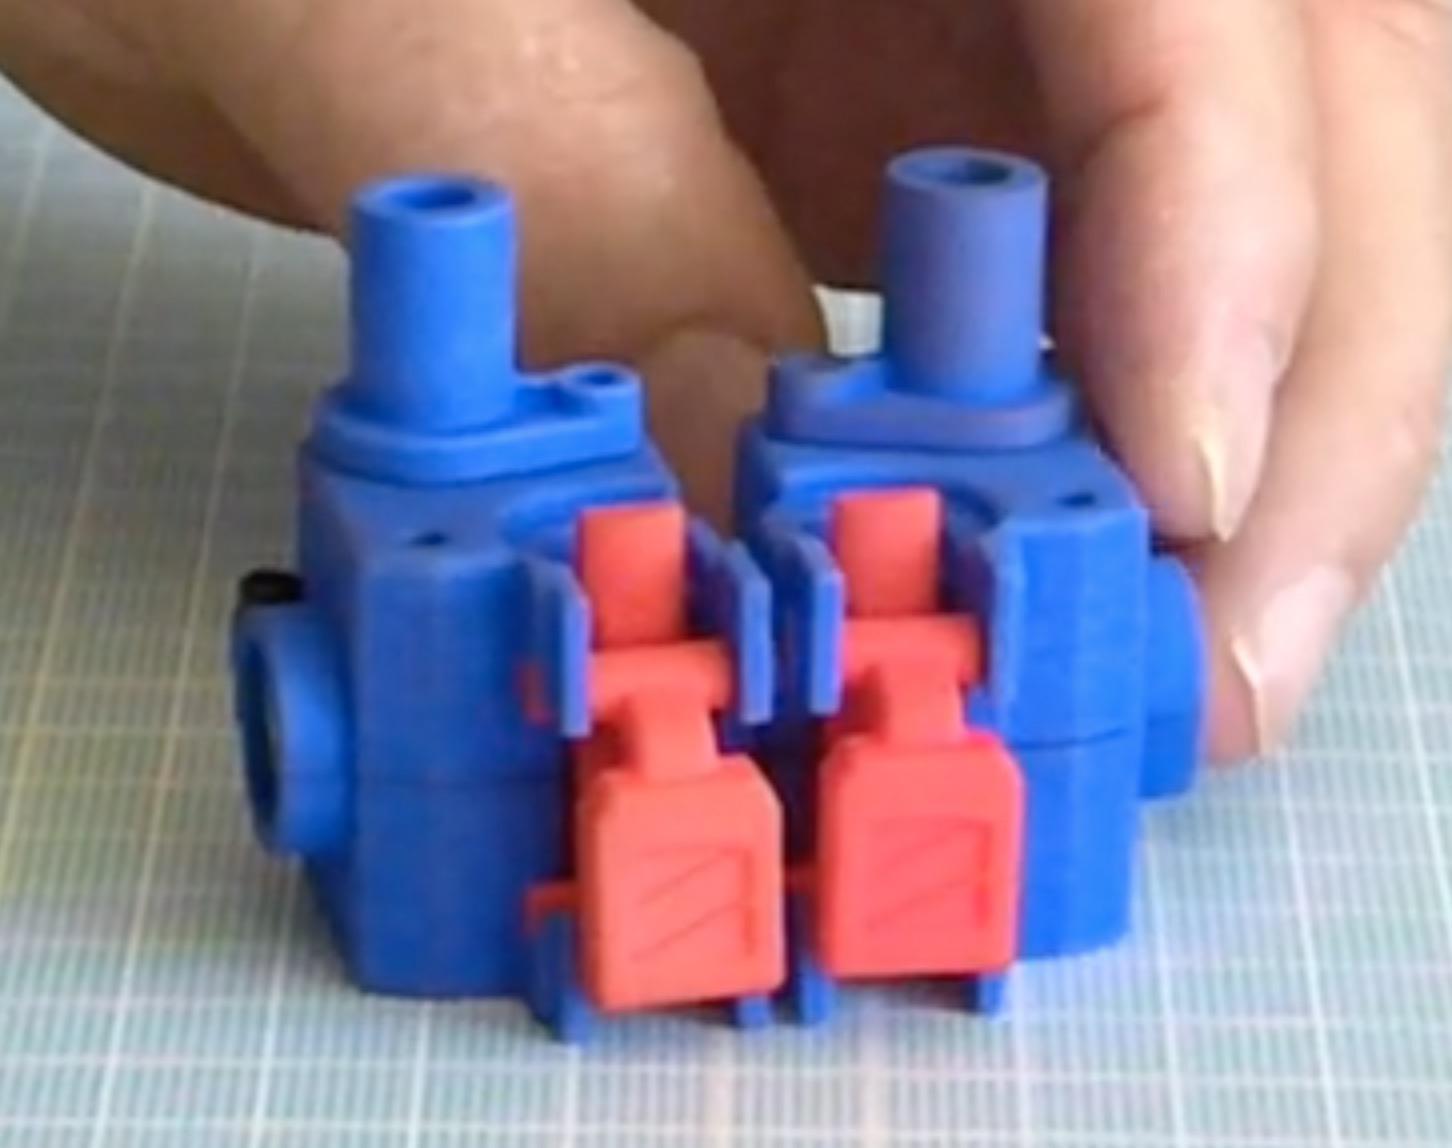 The Zesty Nimble 3D printer extruder is reversible